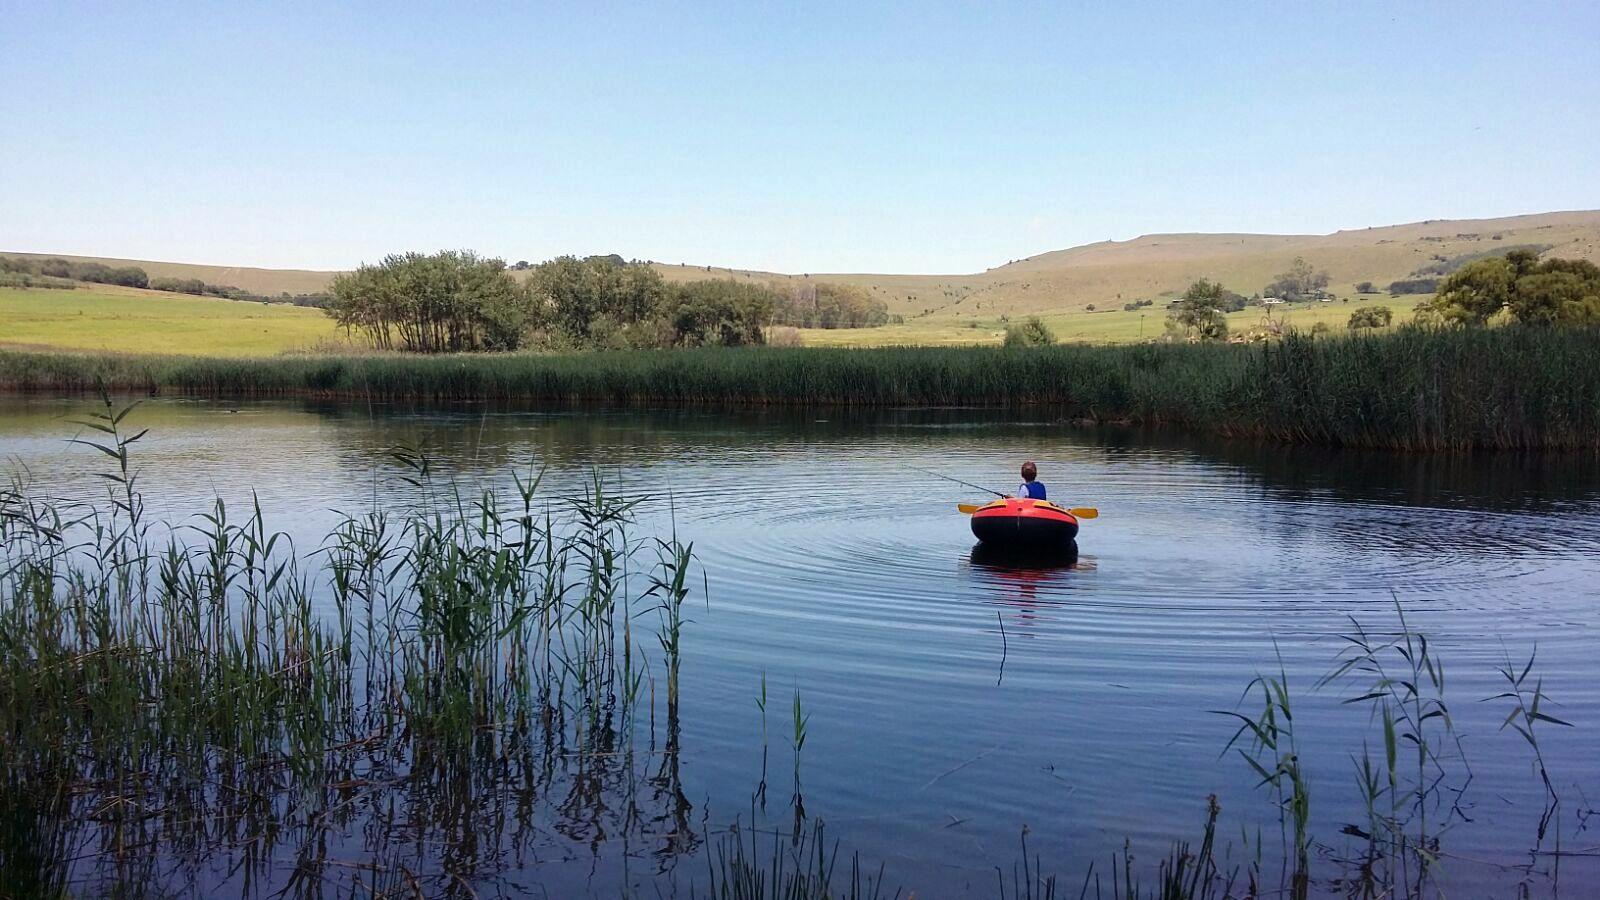 Tubing on Loch Heron